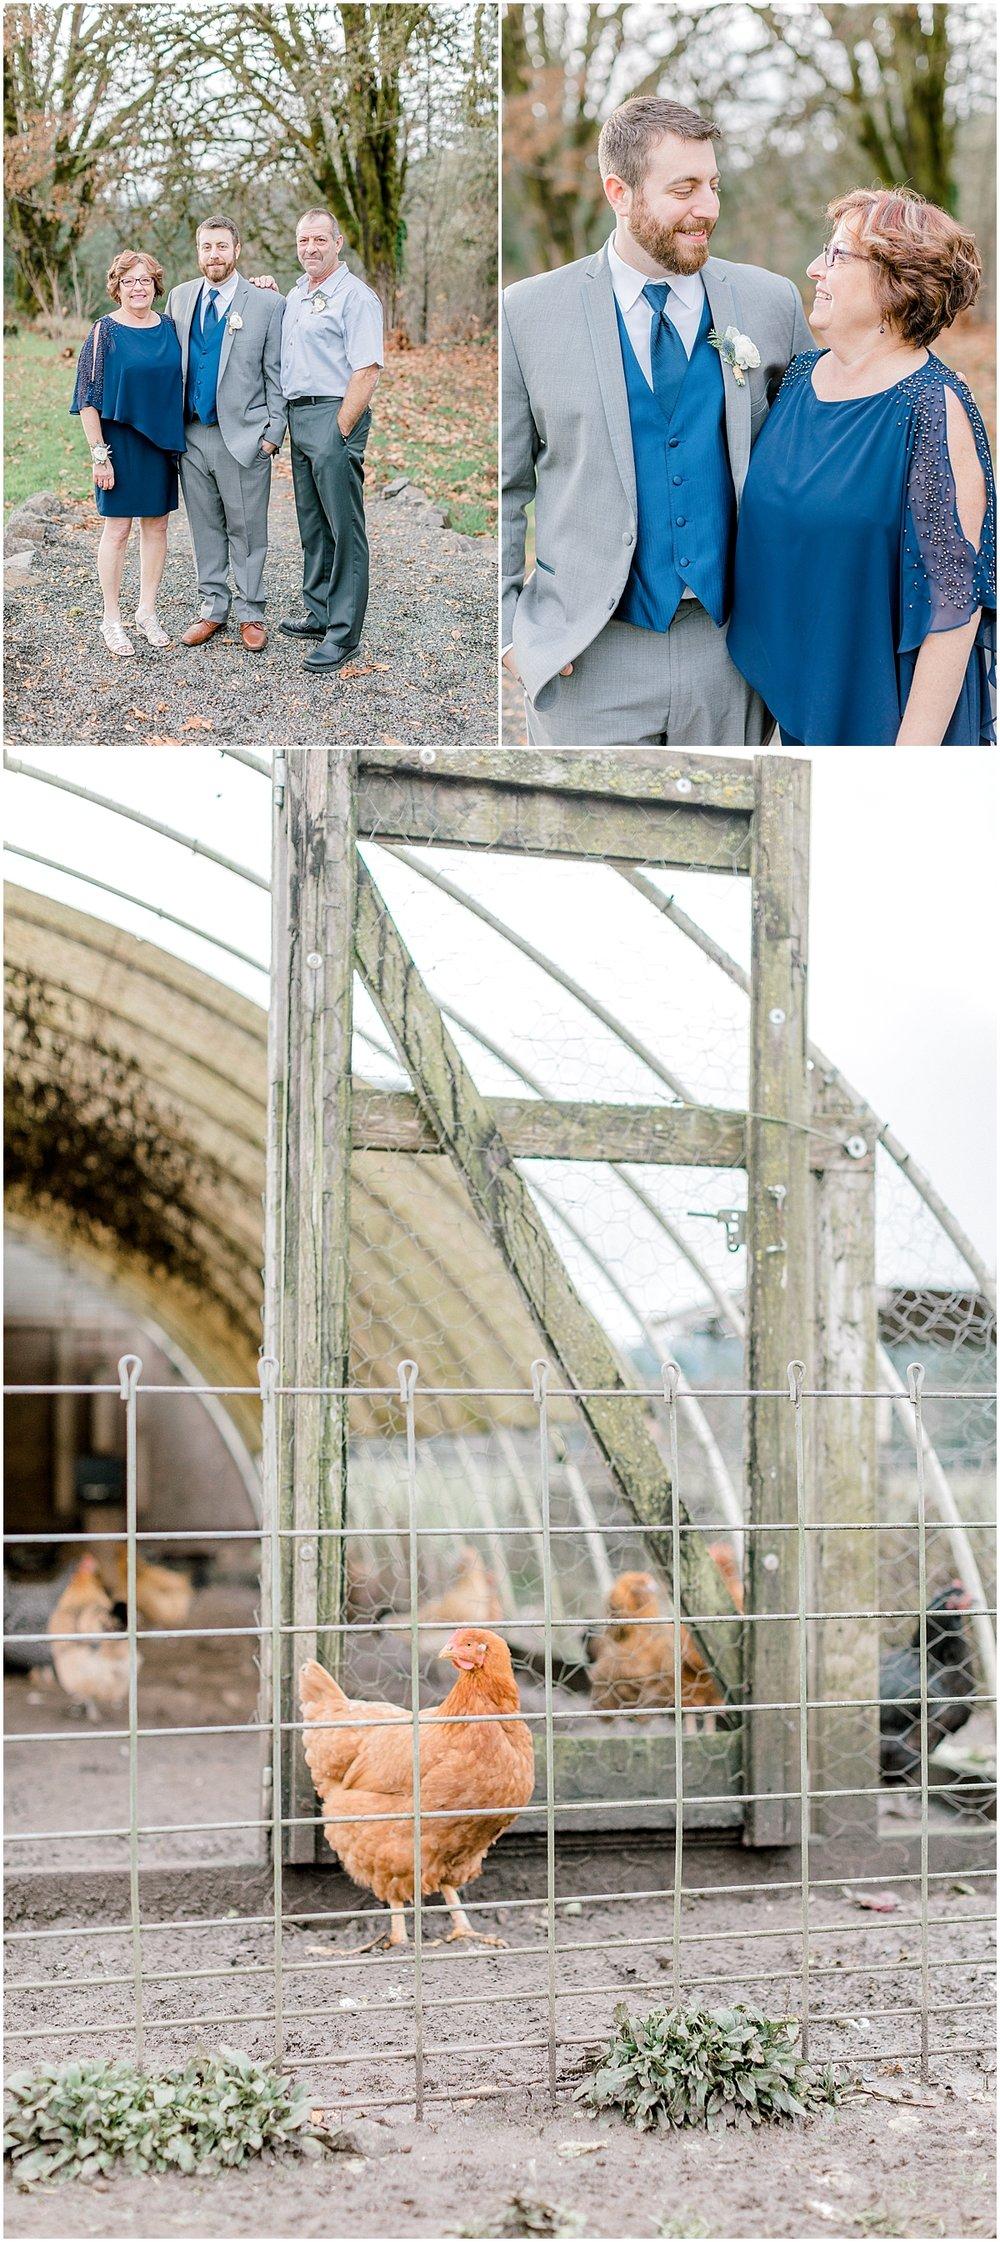 Chehalis Washington Winter Wedding Silver and White | Willapa Hills Farm Wedding | Eastham | Emma Rose Company PNW Light and Airy Wedding Photographer_0036.jpg